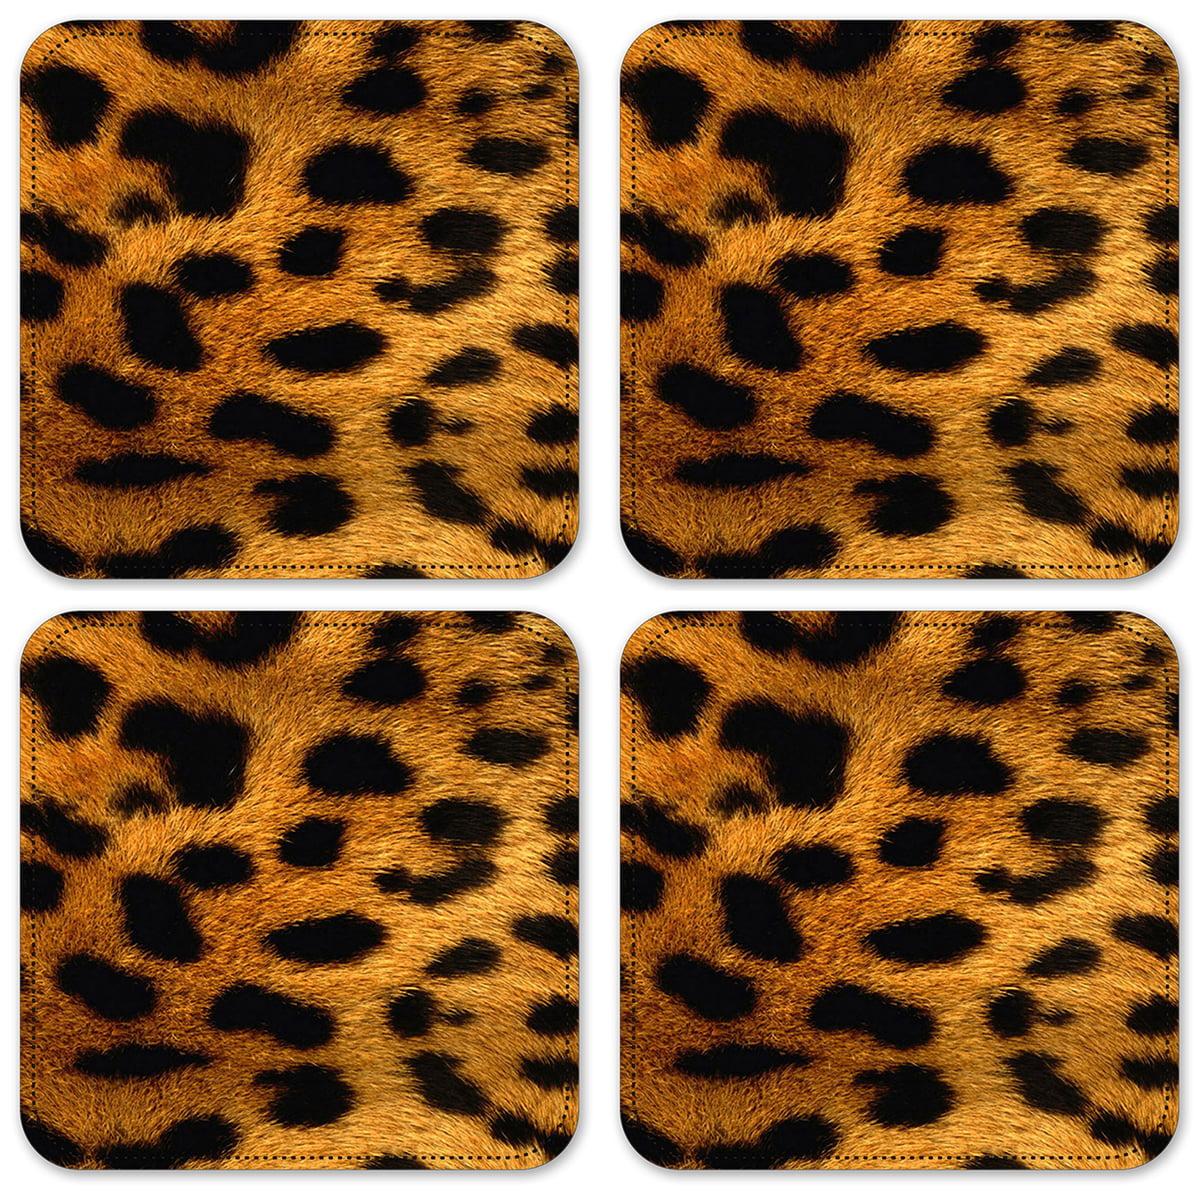 Drink Coasters Entertaining Cloth Fabric Coasters Housewarming Gift Mug Rug Kitchen Table Linen Leopard Jungle Print